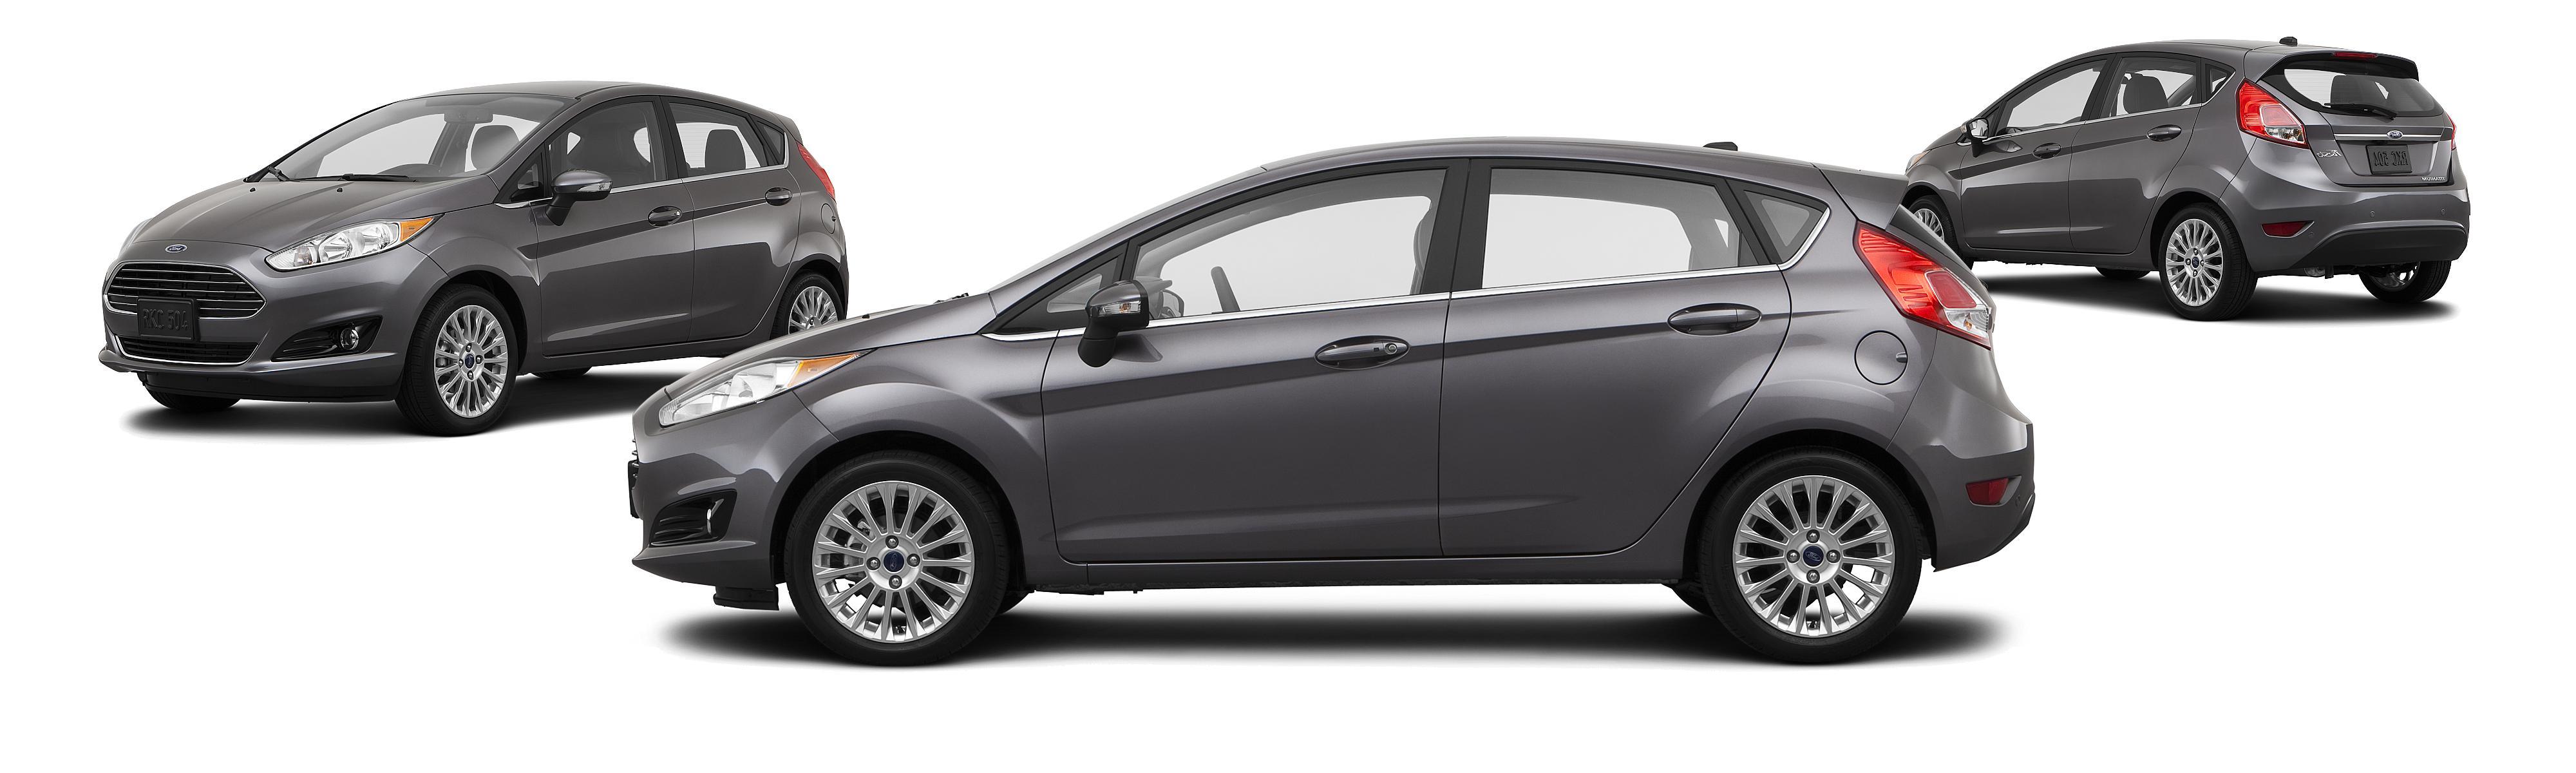 2014 ford fiesta titanium 4dr hatchback research groovecar rh groovecar com